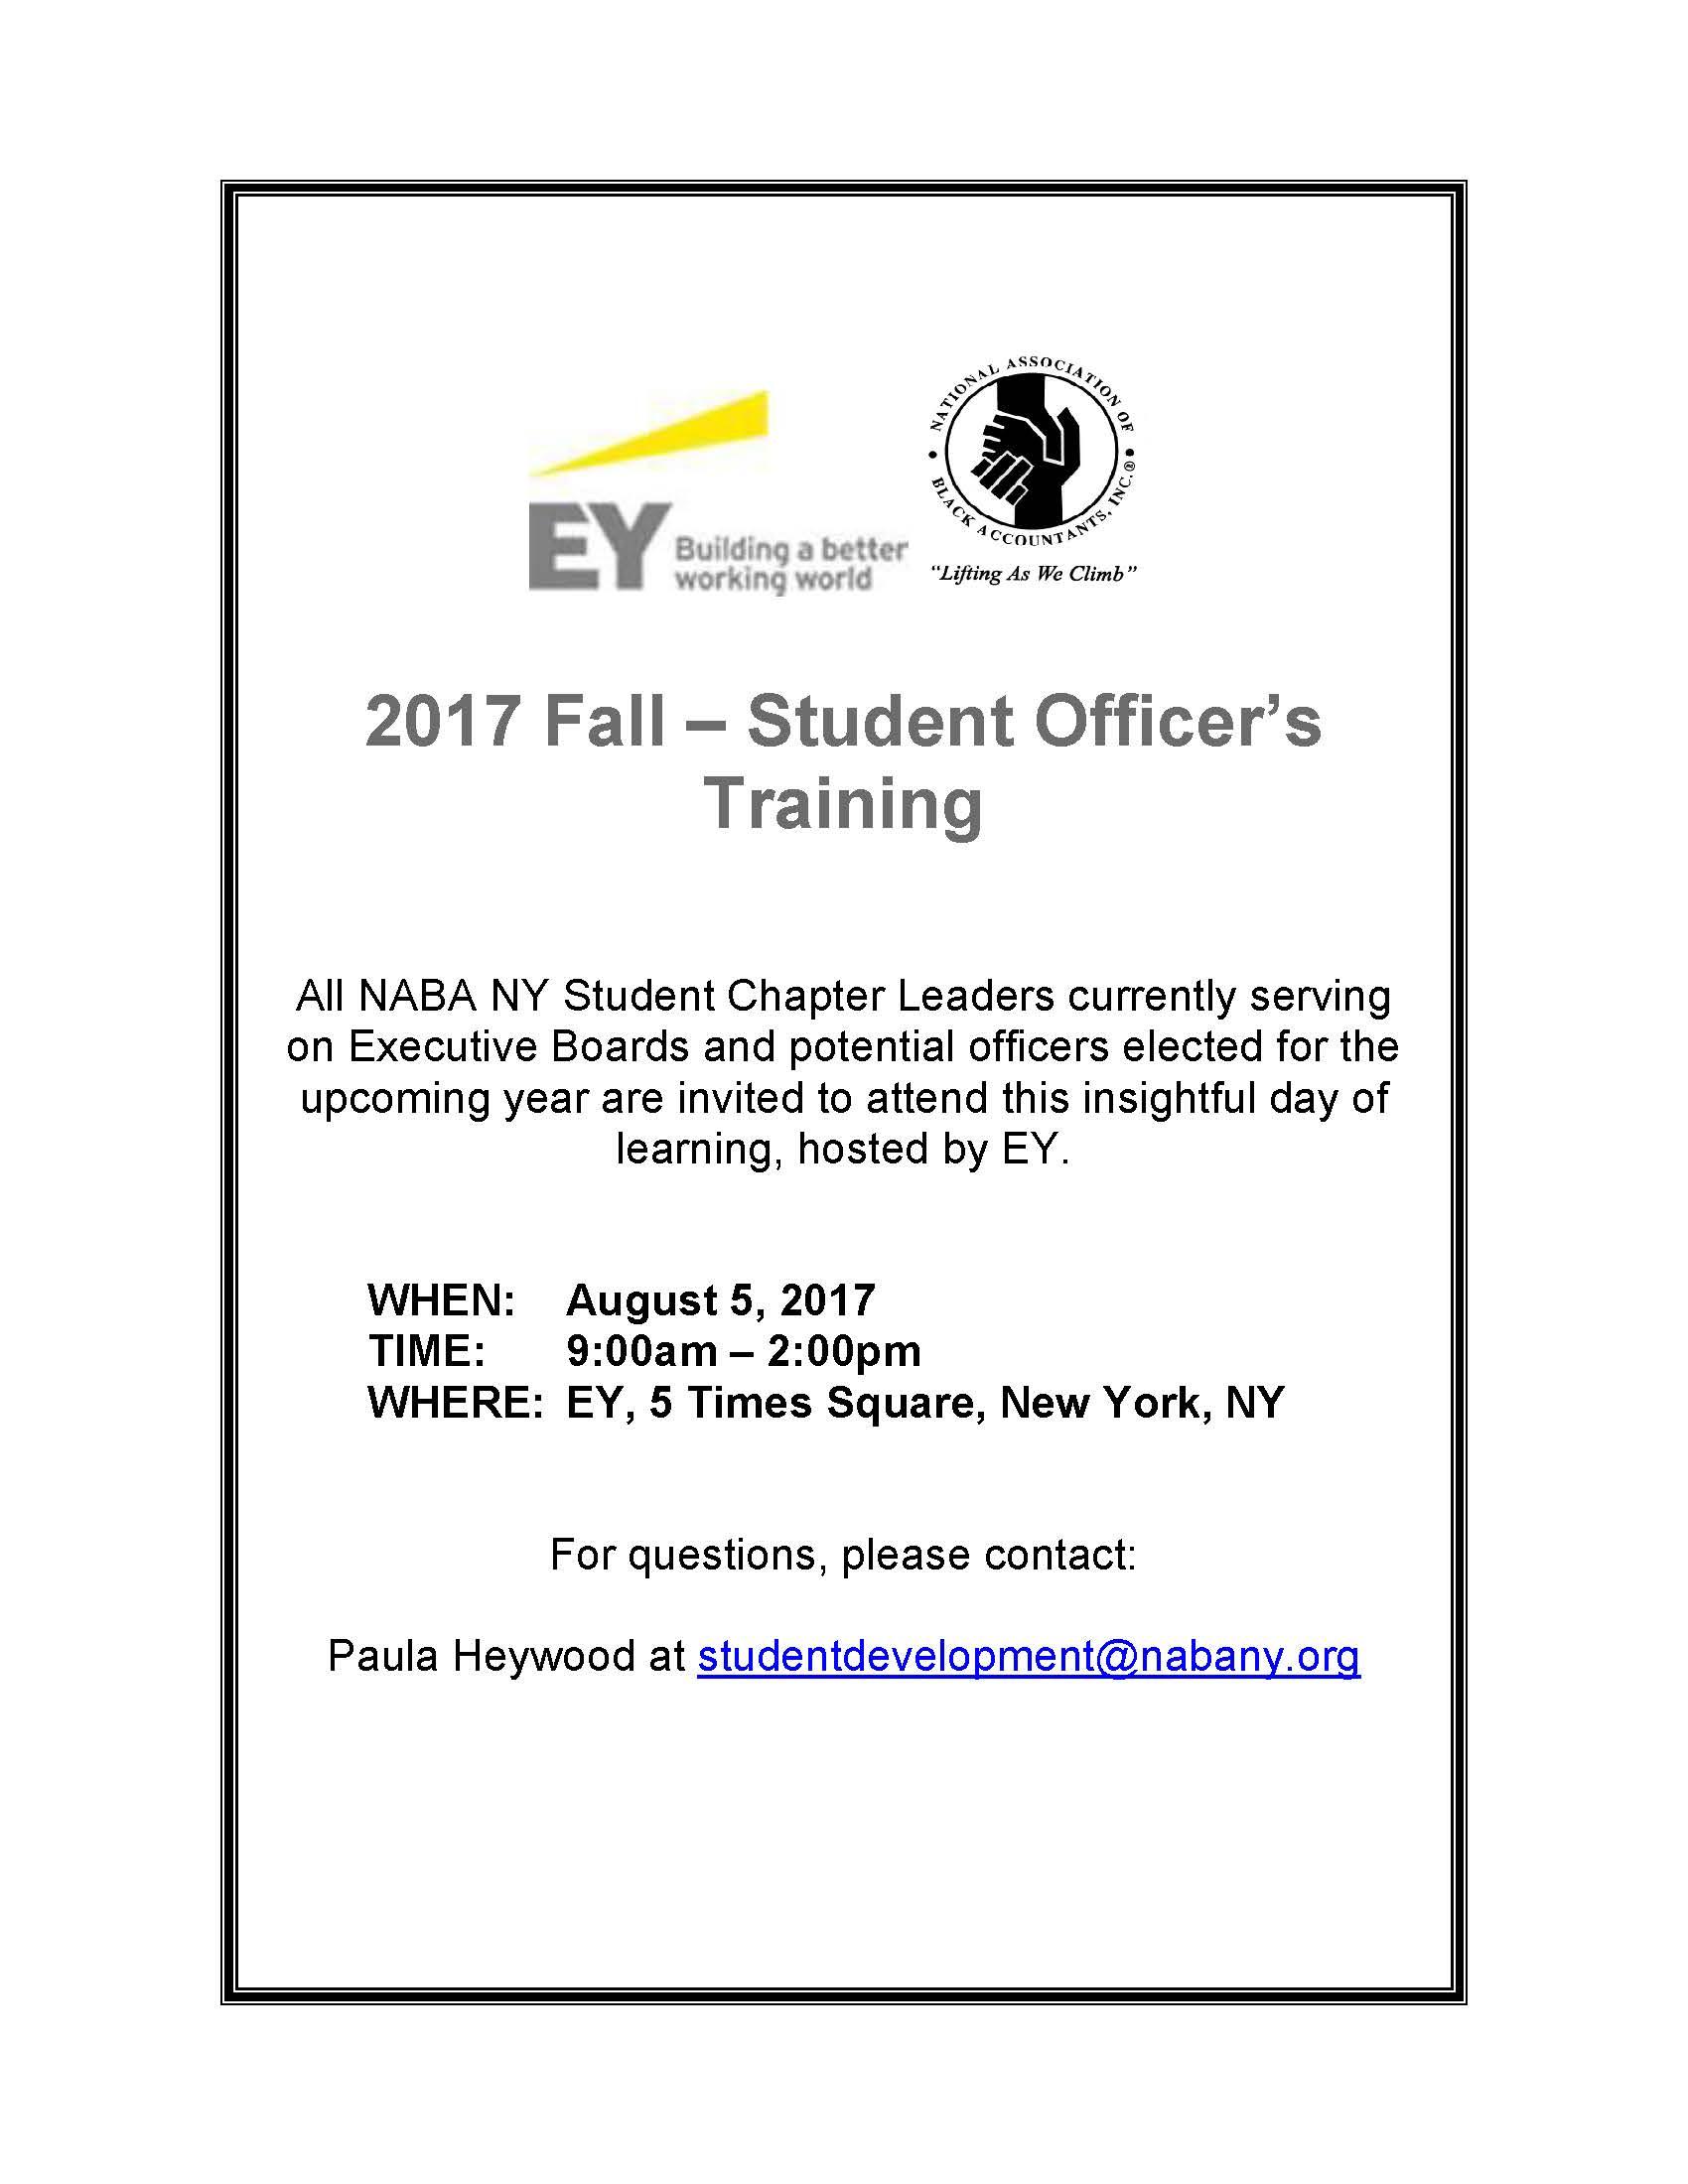 EY 2017 Fall Officer's Training_Updated.jpg